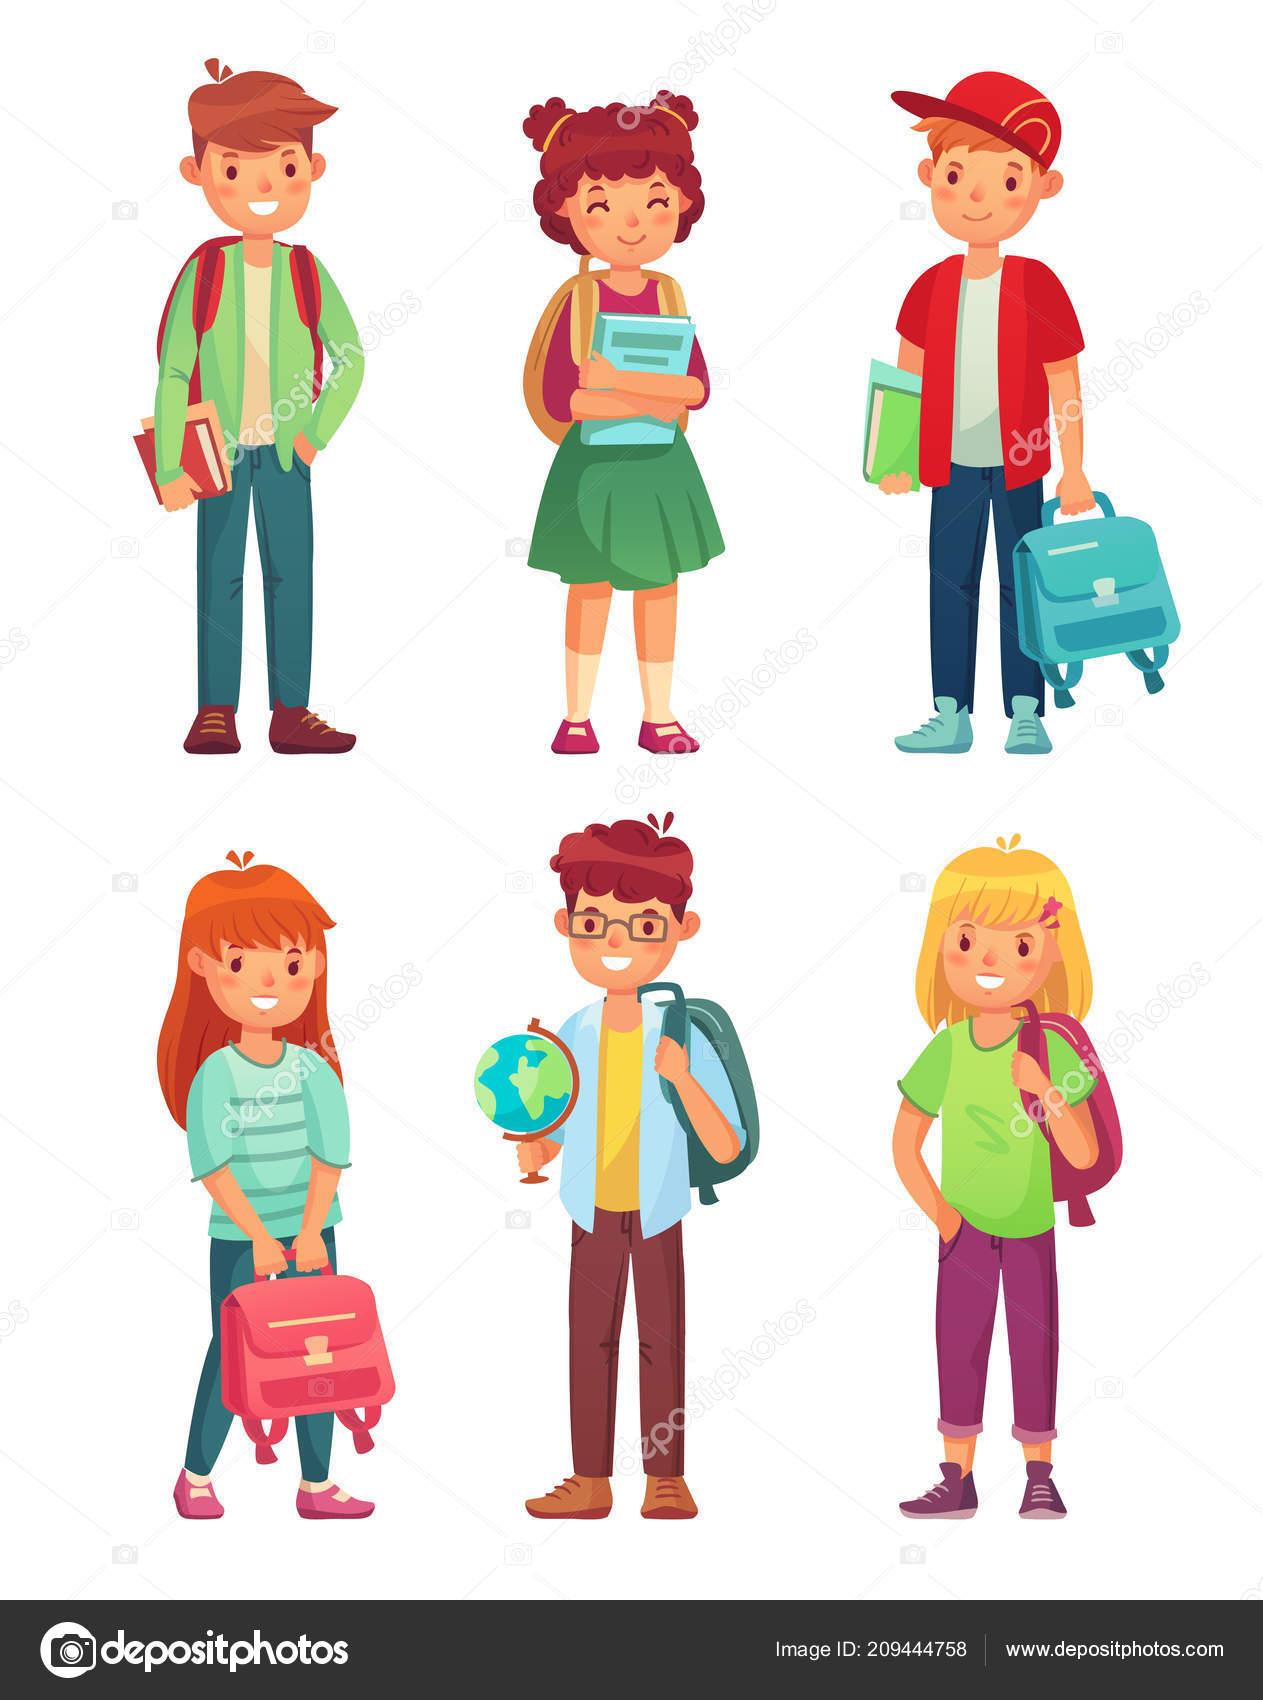 aa6deaf0789 Μαθητές γυμνασίου και Λυκείου. Παιδιά μαθητές με υδρόγειο, βιβλία και σακίδιο  πλάτης. Σχολεία τα παιδιά μαθητές έξυπνο αγόρι και κορίτσι, μαθητής  διεθνούς ...